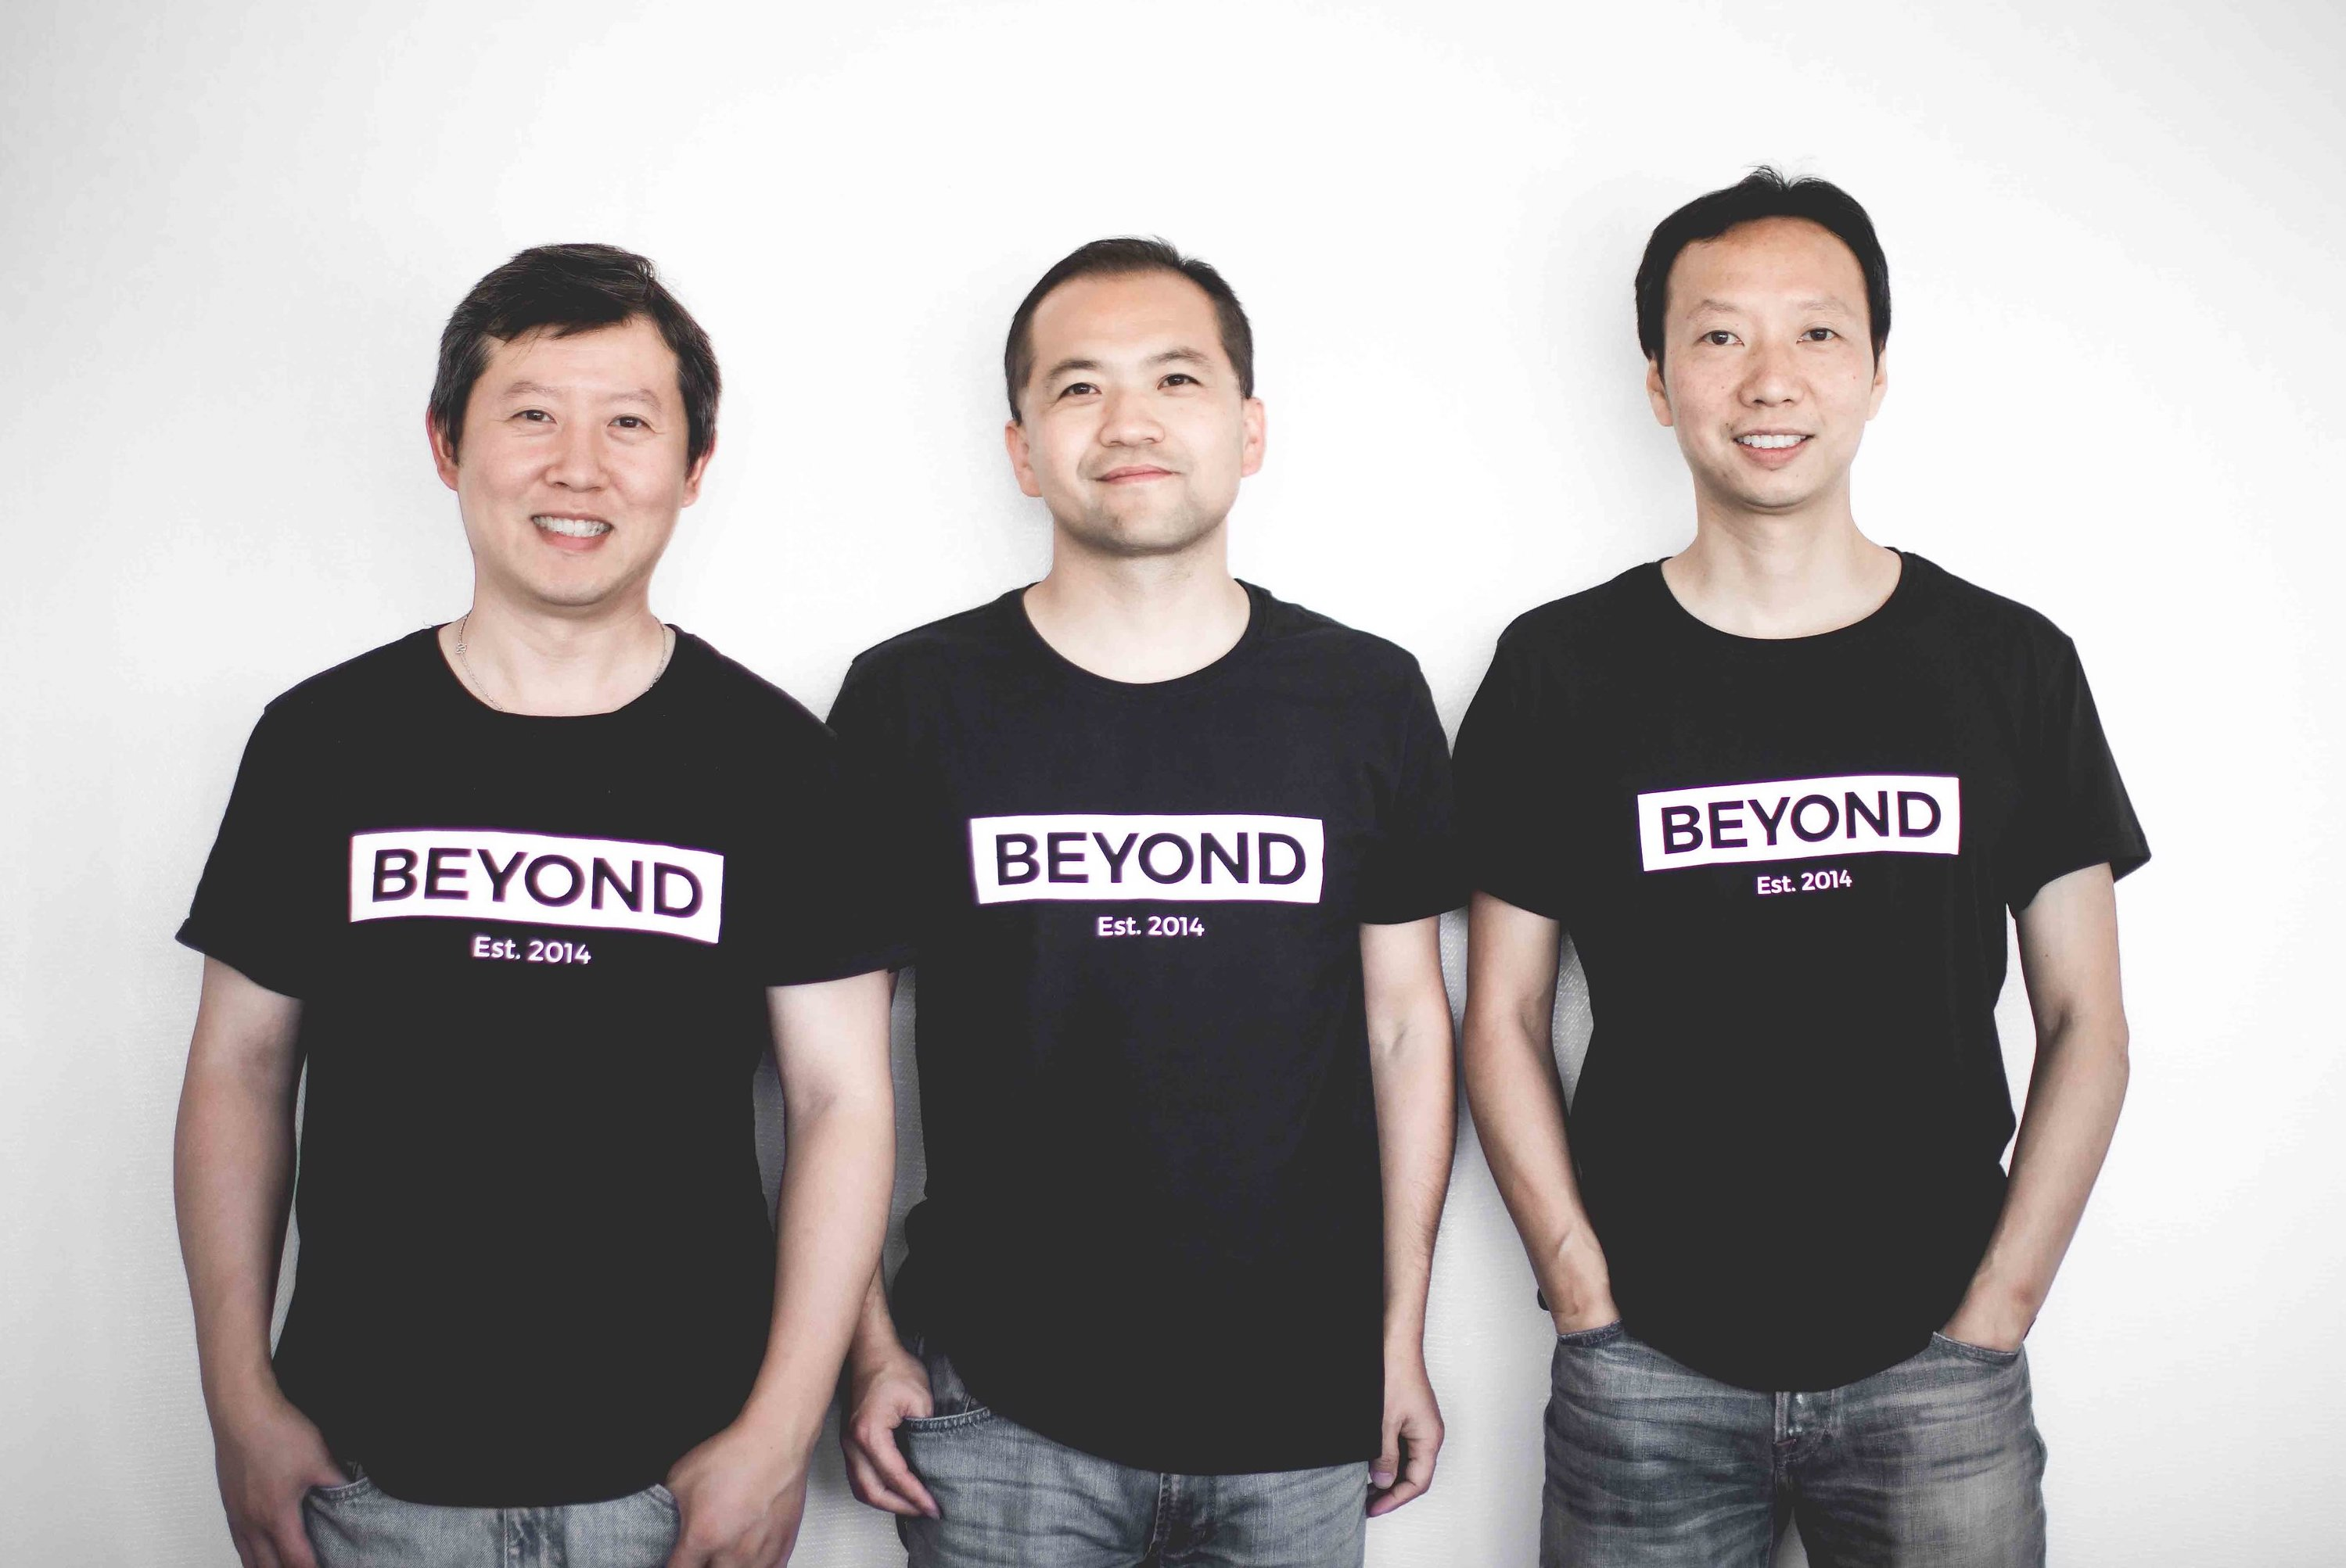 BorderX Lab cofounders, from left to right: Liu Jun, Albert Shen, and Huang Chengdu.